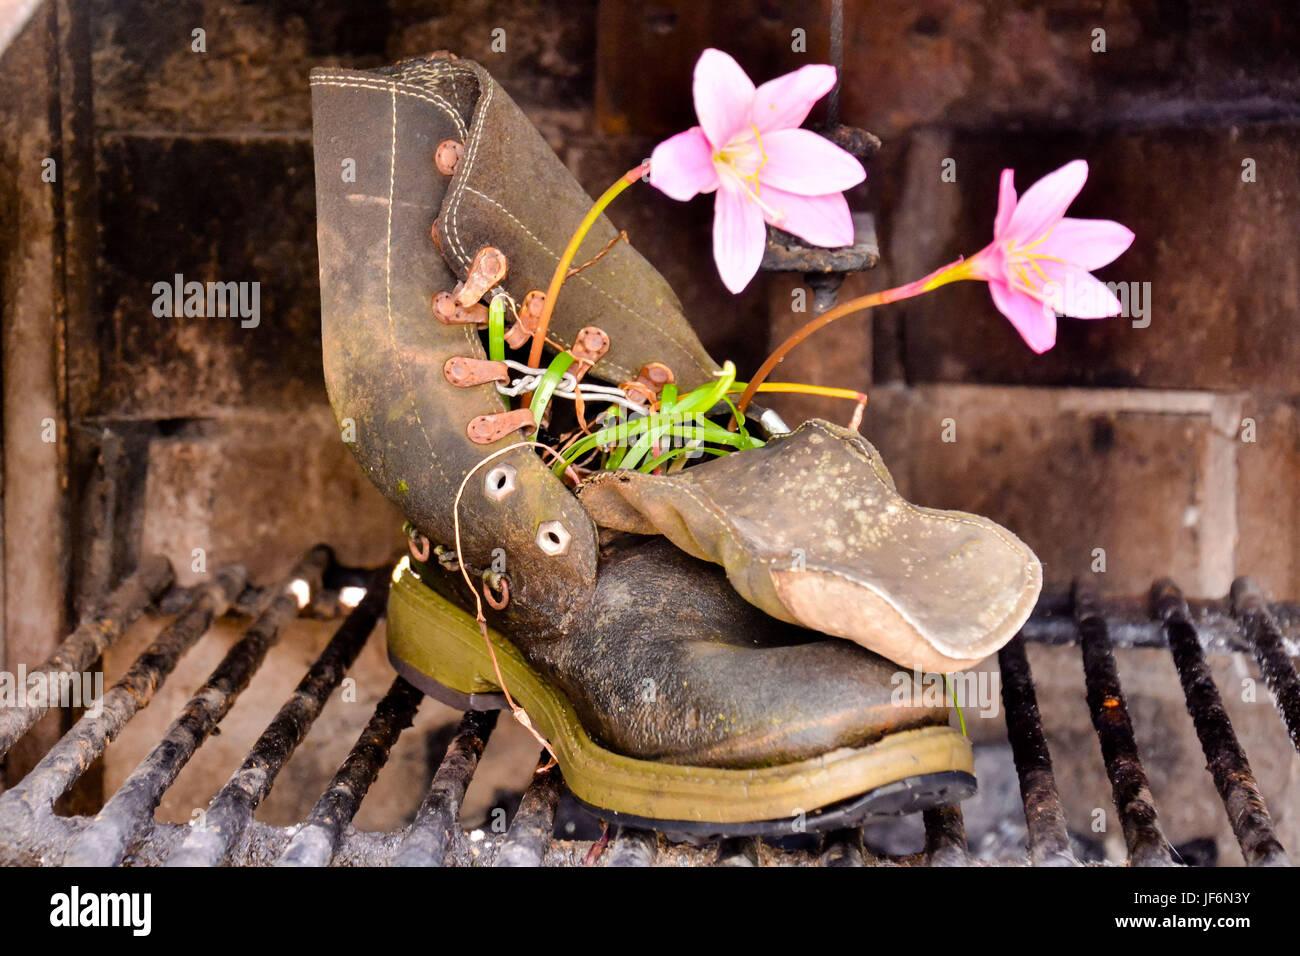 Strange Unusual Plant Pot - Stock Image